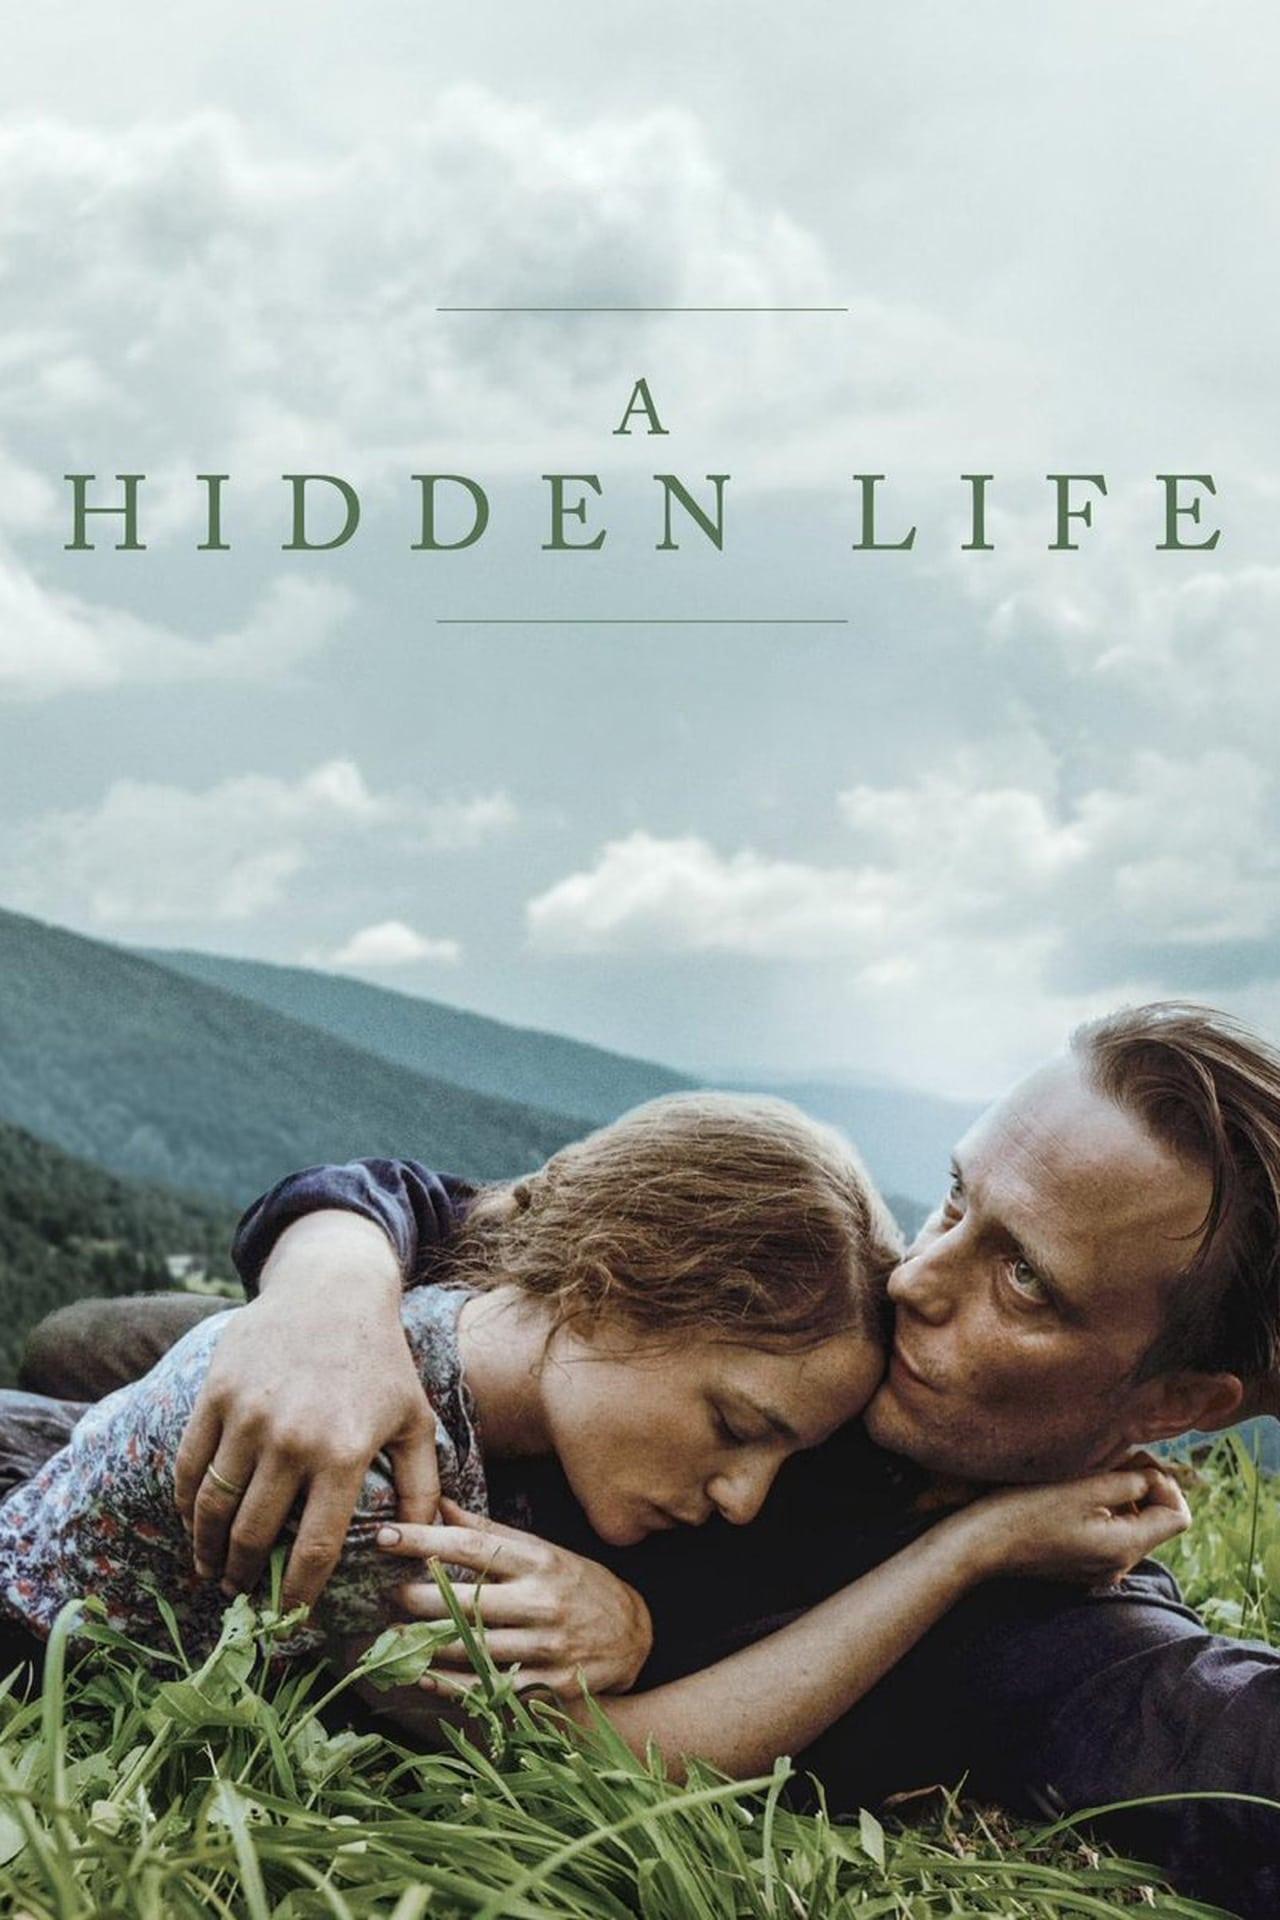 A Hidden Life image